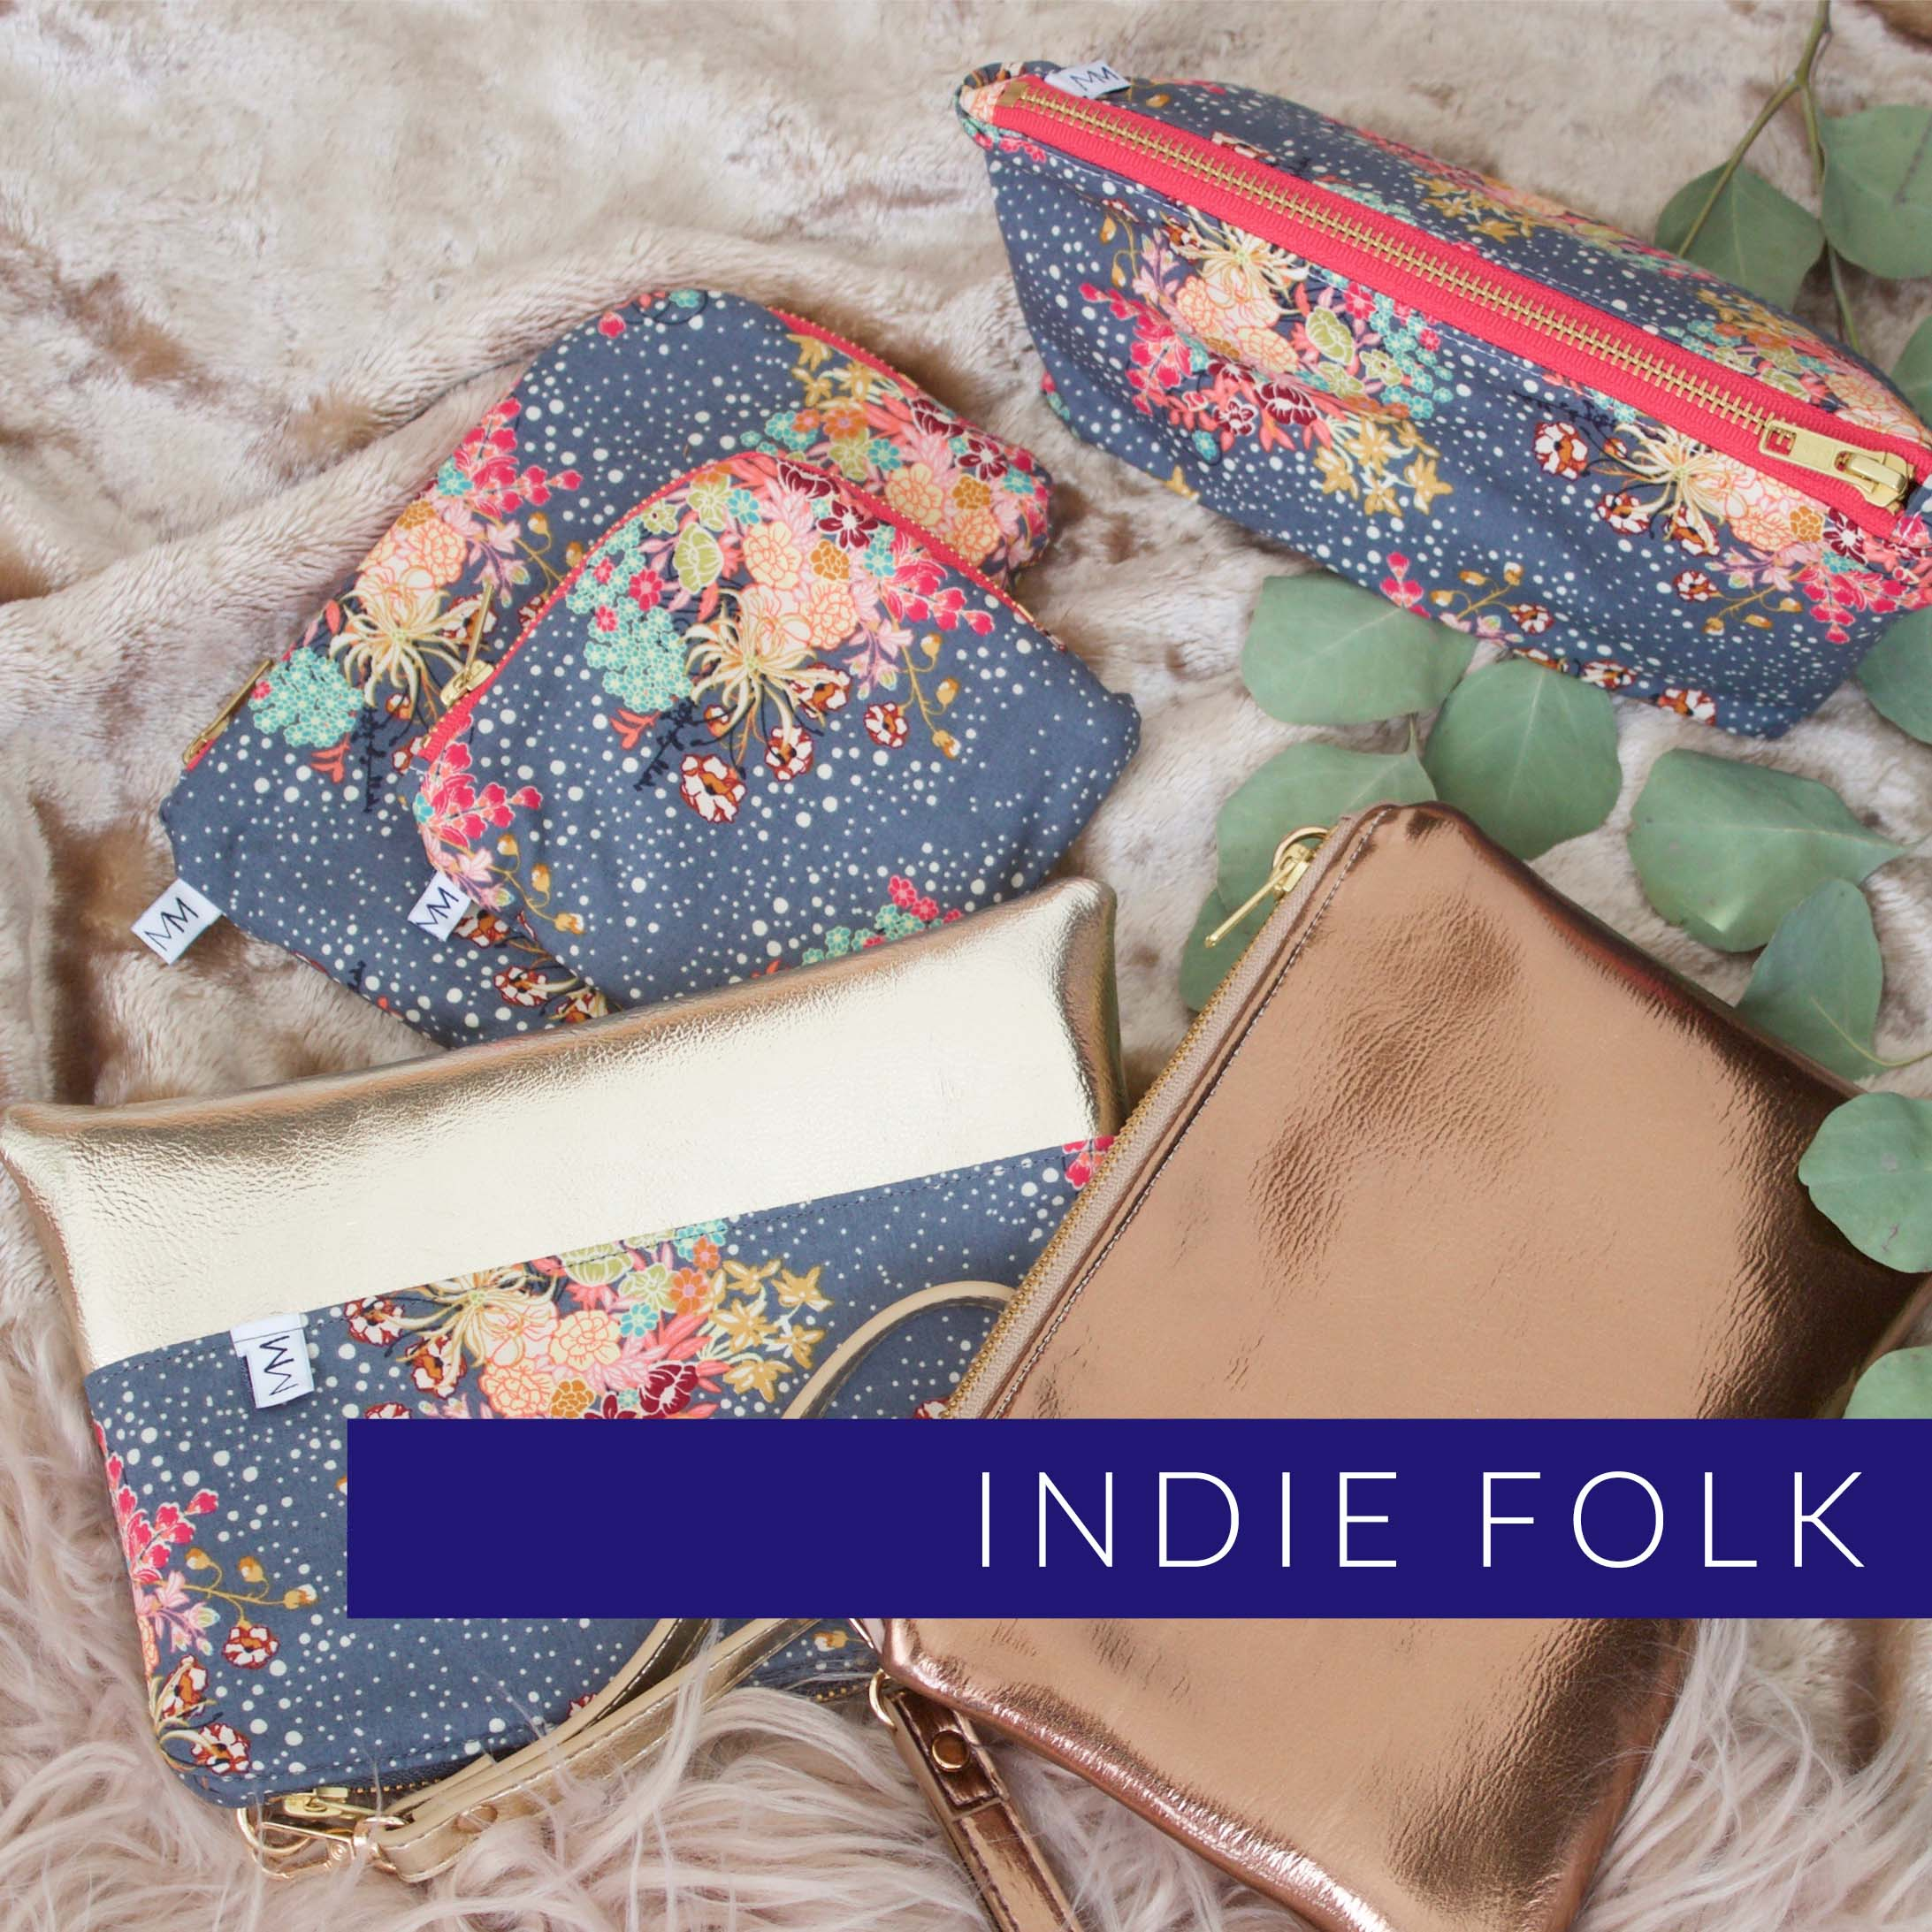 indie folk collection icon.jpg